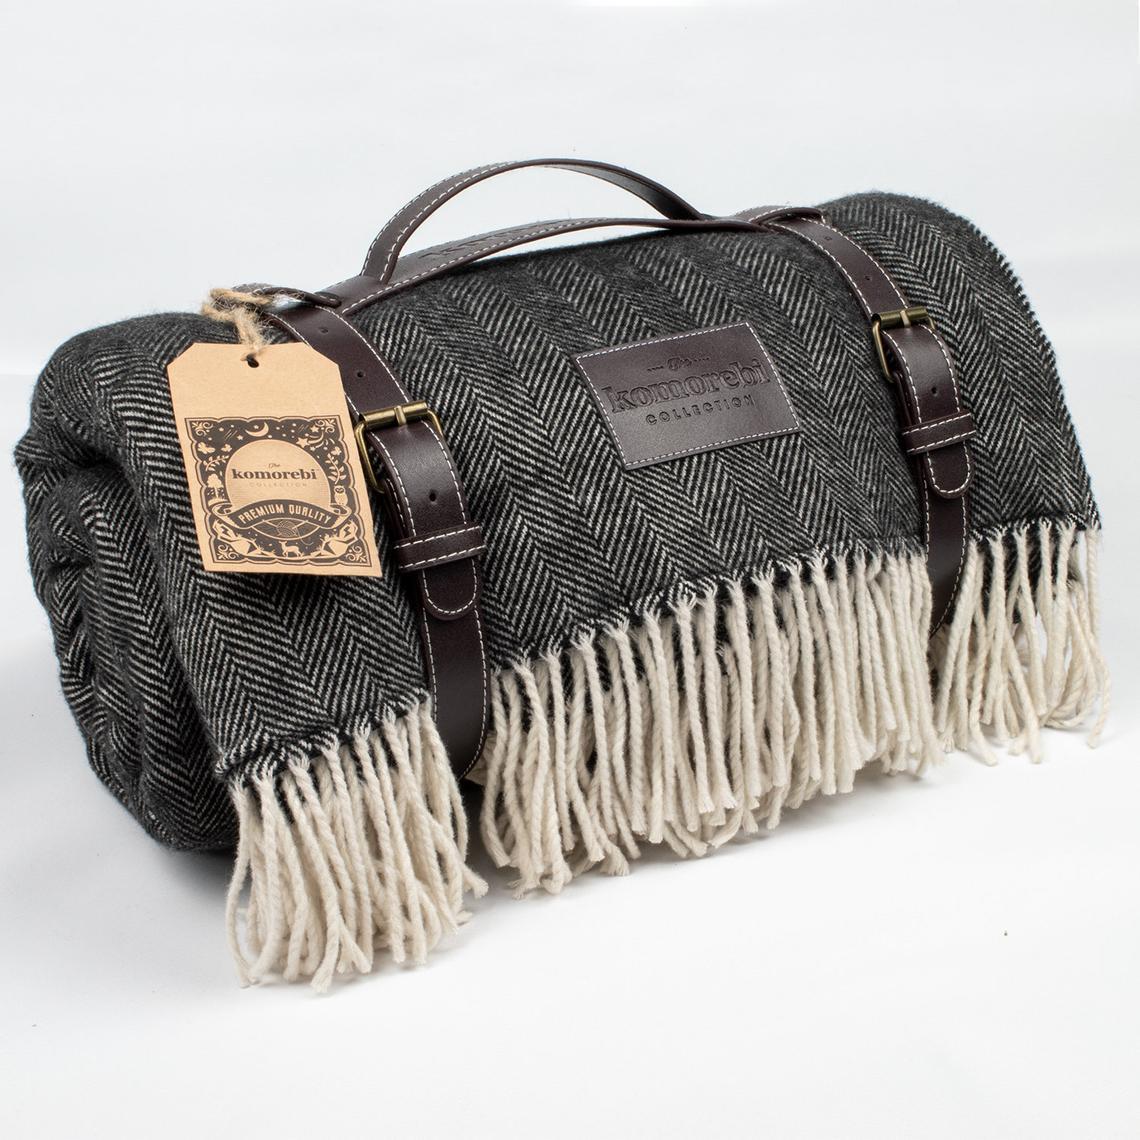 Komorebi Collection Extra Large Luxurious Faux Wool/Waterproof Picnic Blanket